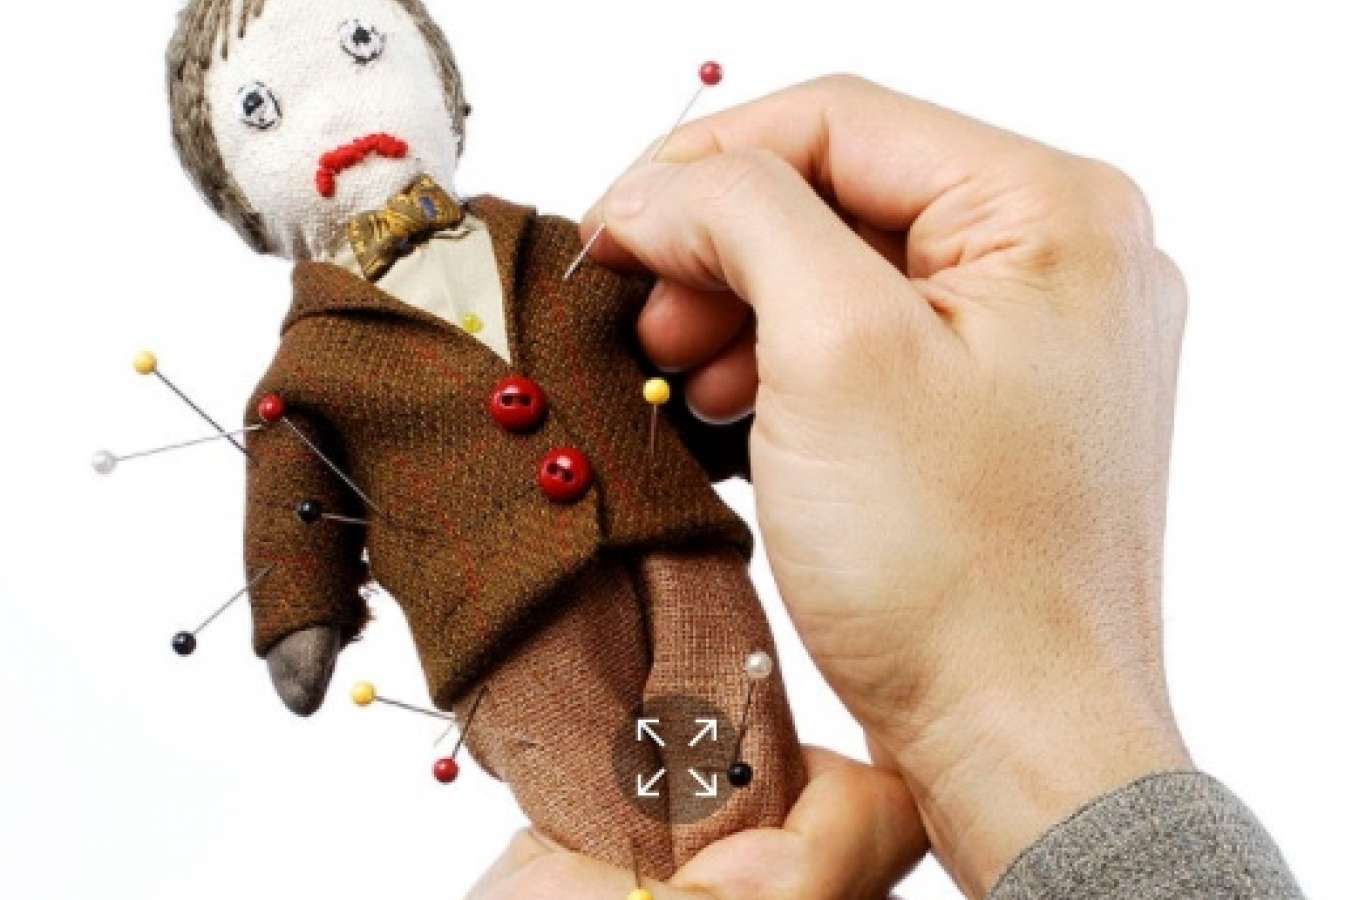 Jockey the subject of alleged voodoo magic